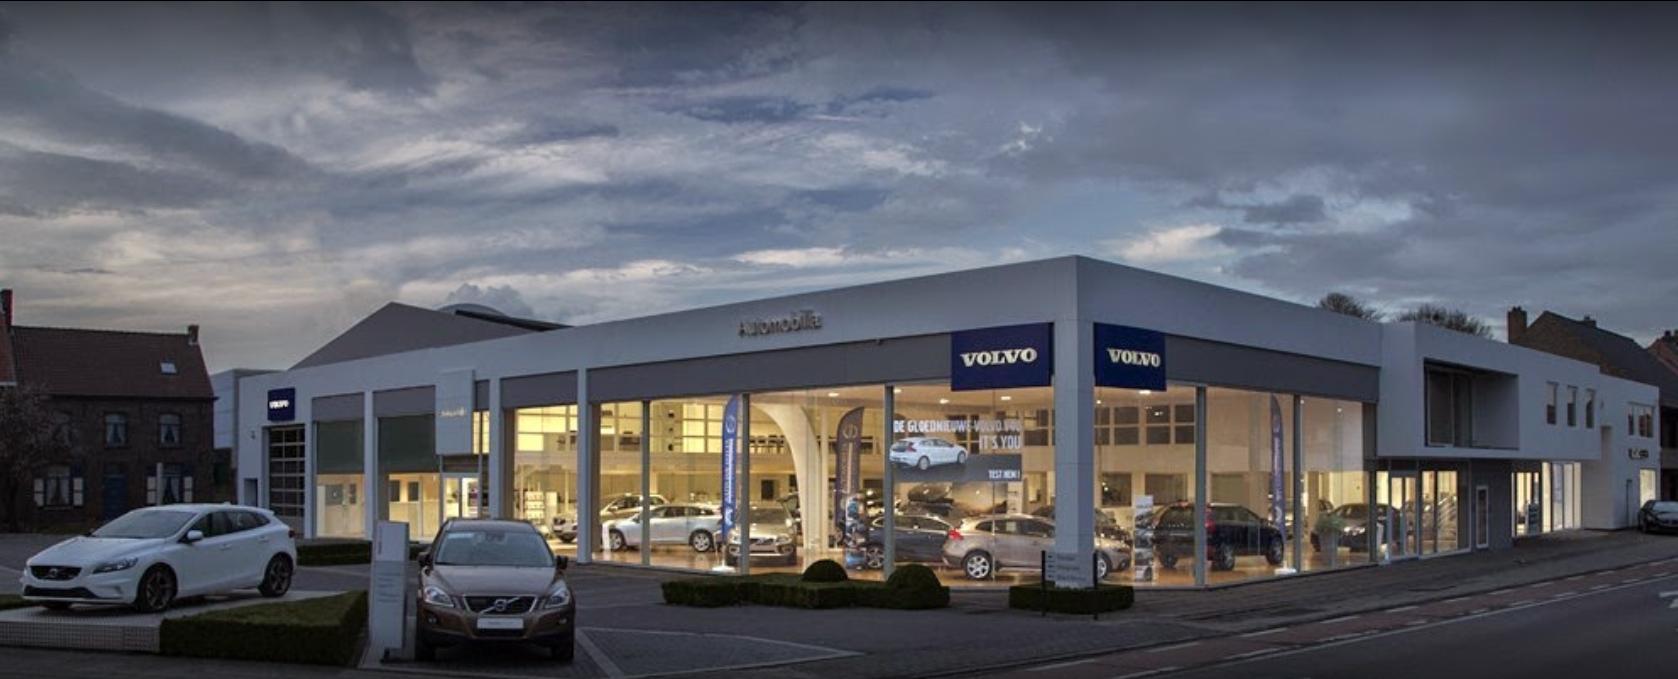 Automobilia - Volvo / Brugge (voorheen De Grande Cars)